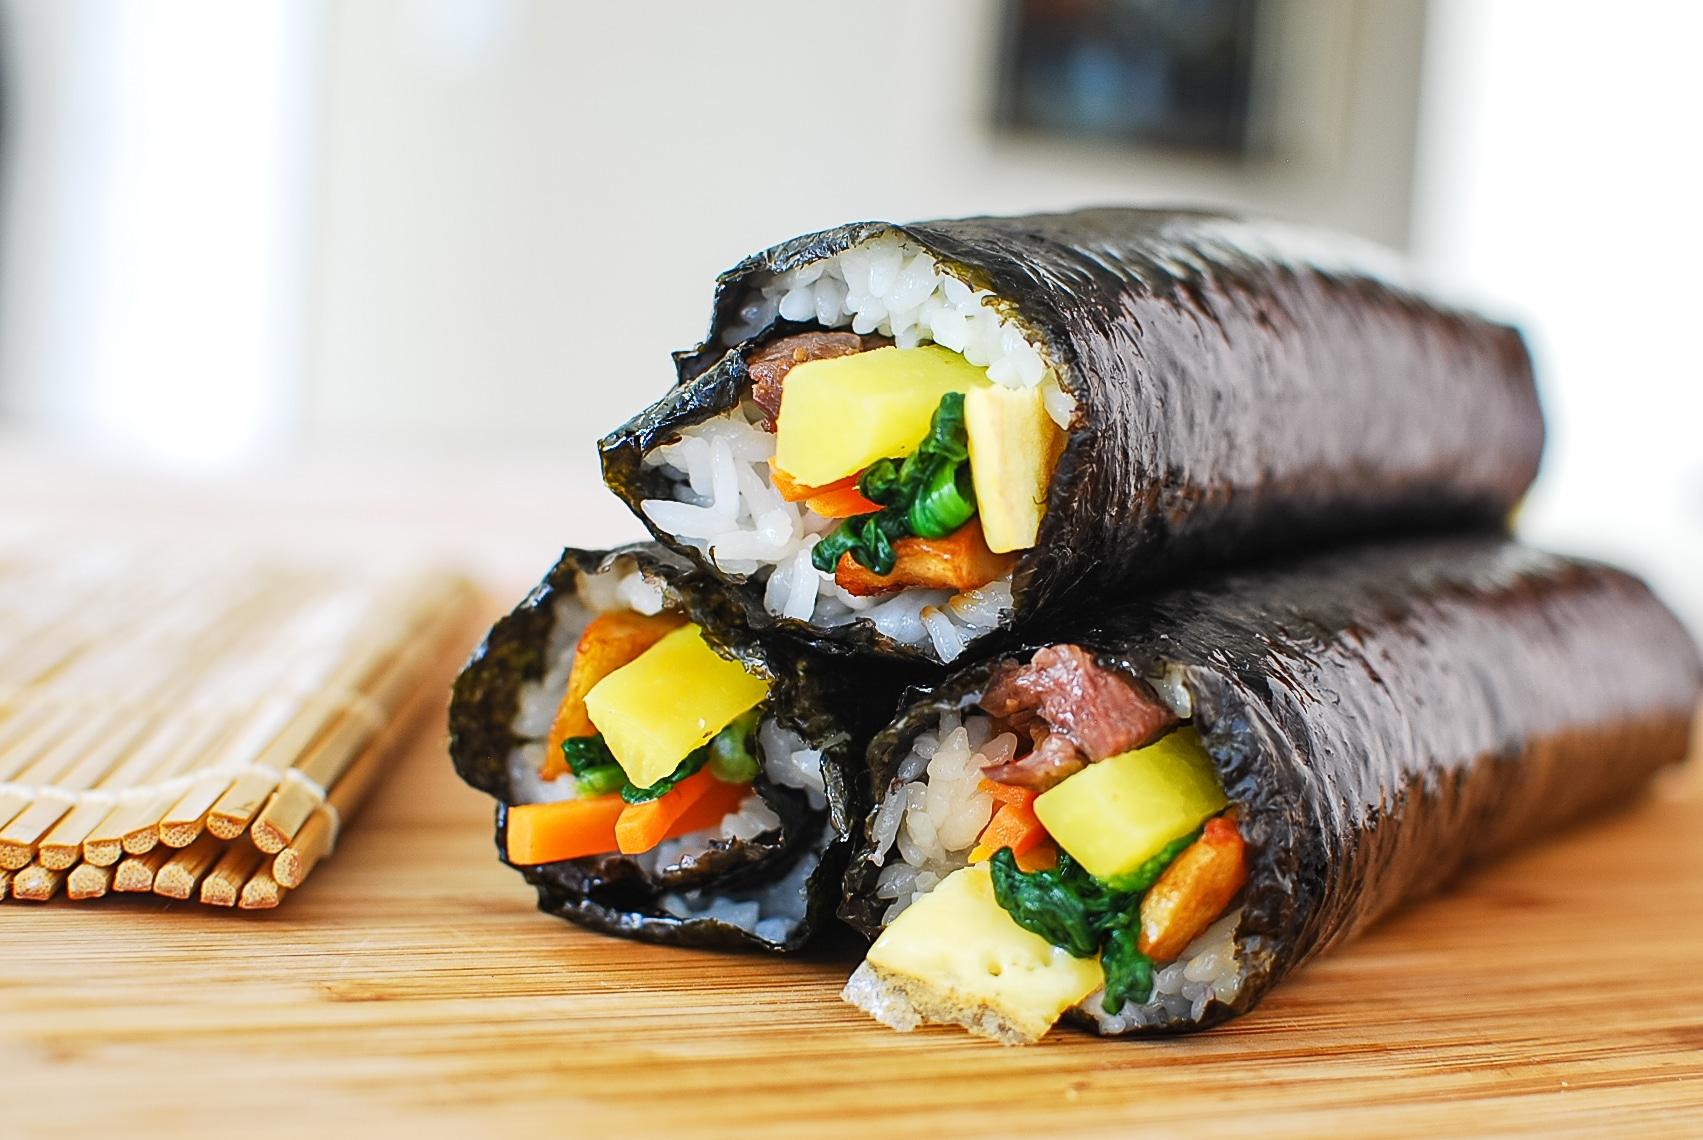 DSC 1648 - Gimbap (Korean Seaweed Rice Rolls)